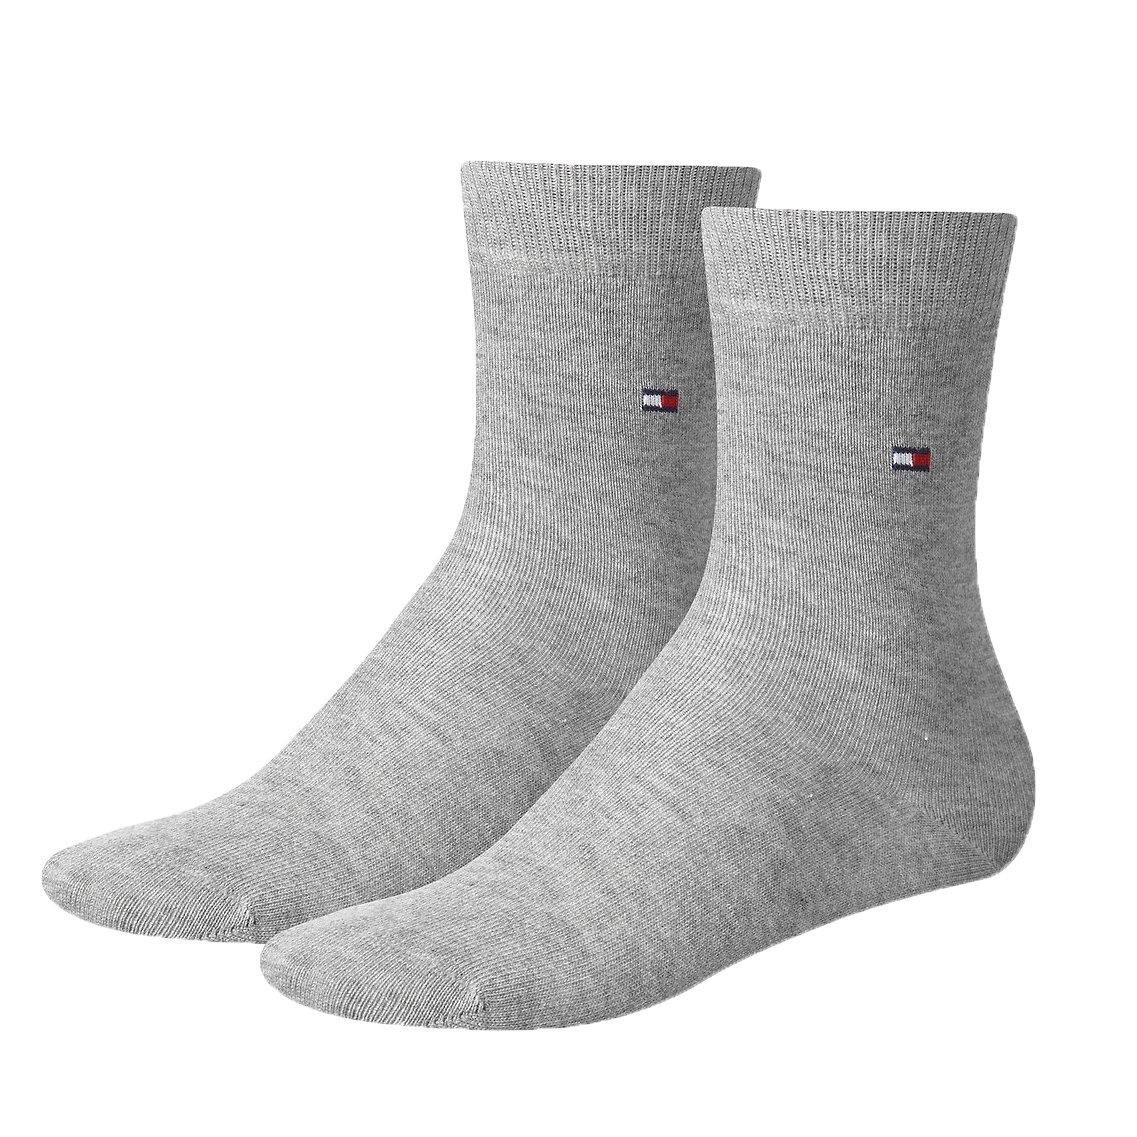 d4abfada6 Tommy Hilfiger classic socks mid grey 2-pak